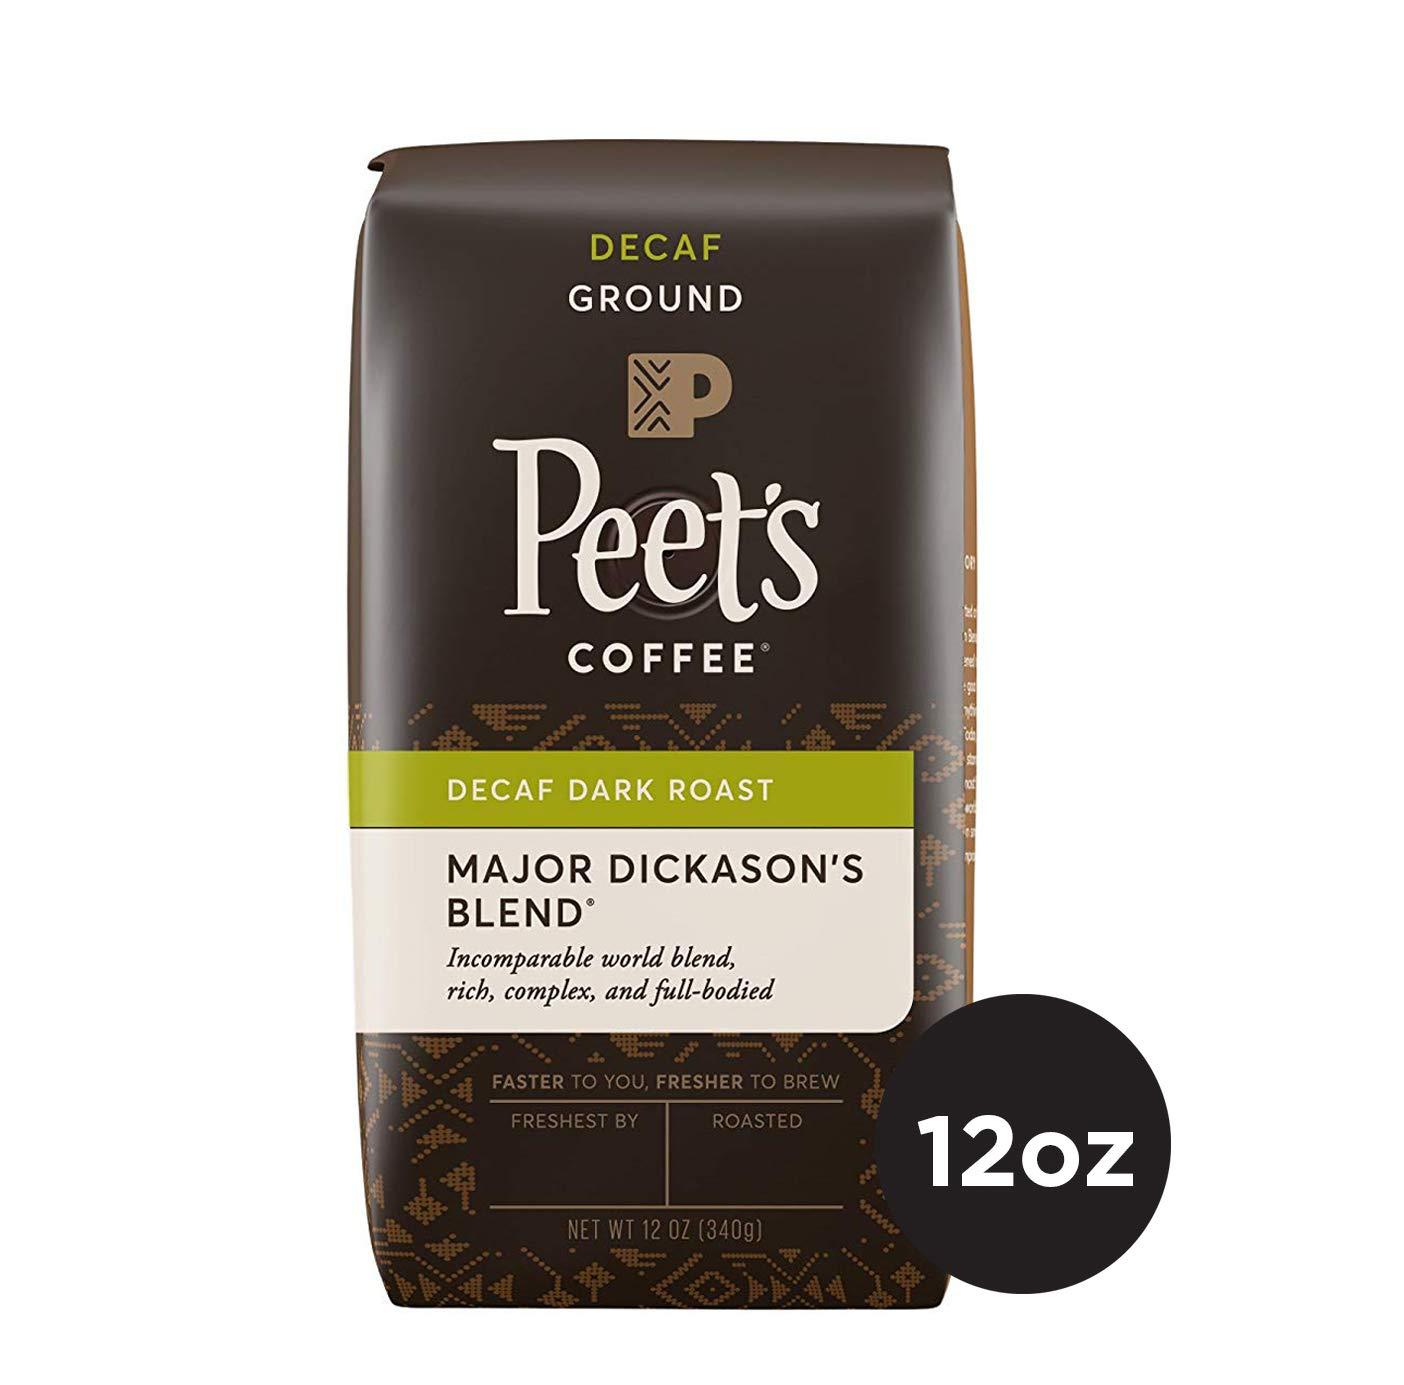 Peet's Coffee Decaf Major Dickason's Blend Dark Roast Ground Coffee, 12 Ounce Bag